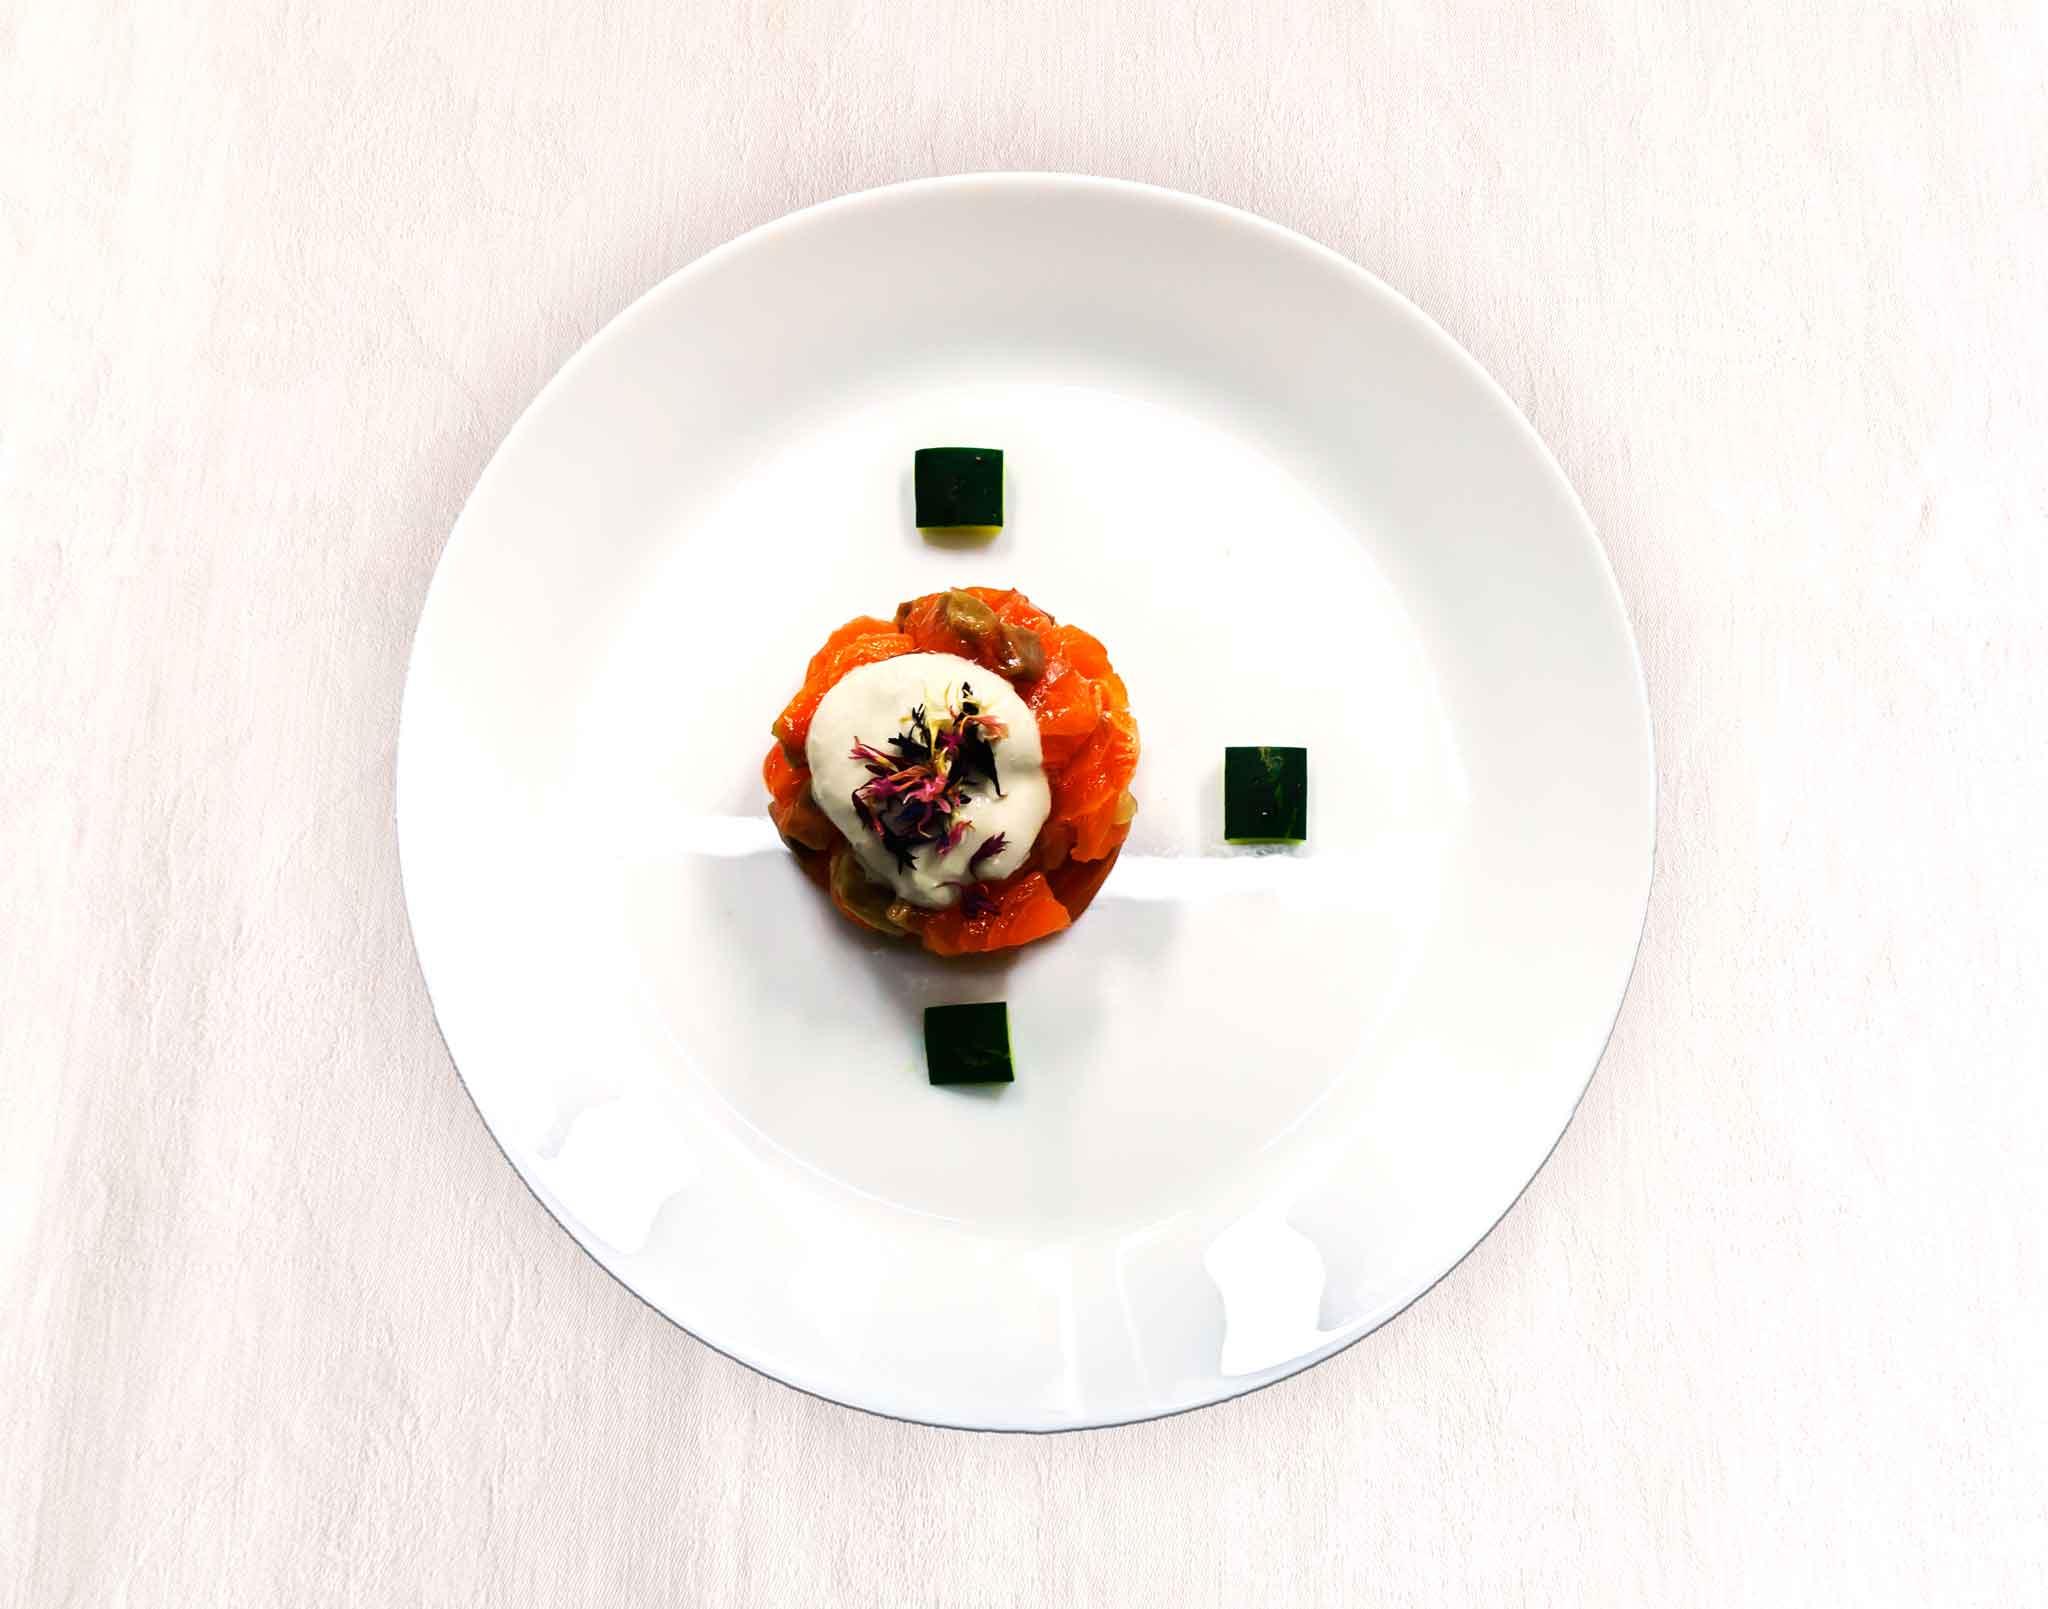 tartare di salmone mangio